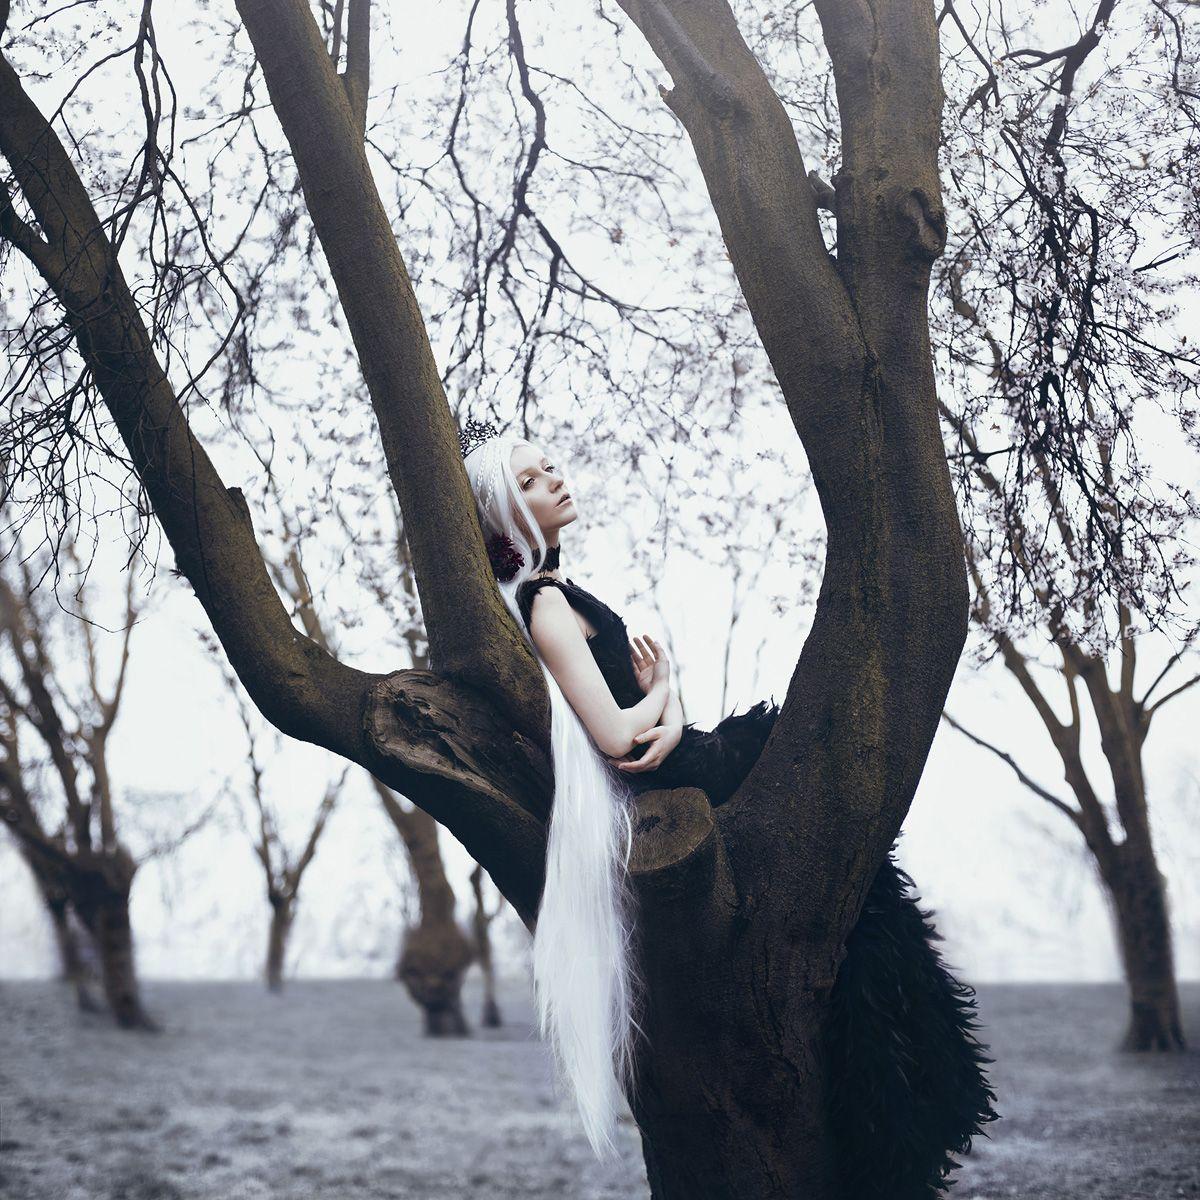 Photographer: Bella Kotak / Designer: Kathryn Love / Makeup: Lydia Pankhurst / Model: Lulu Lockhart